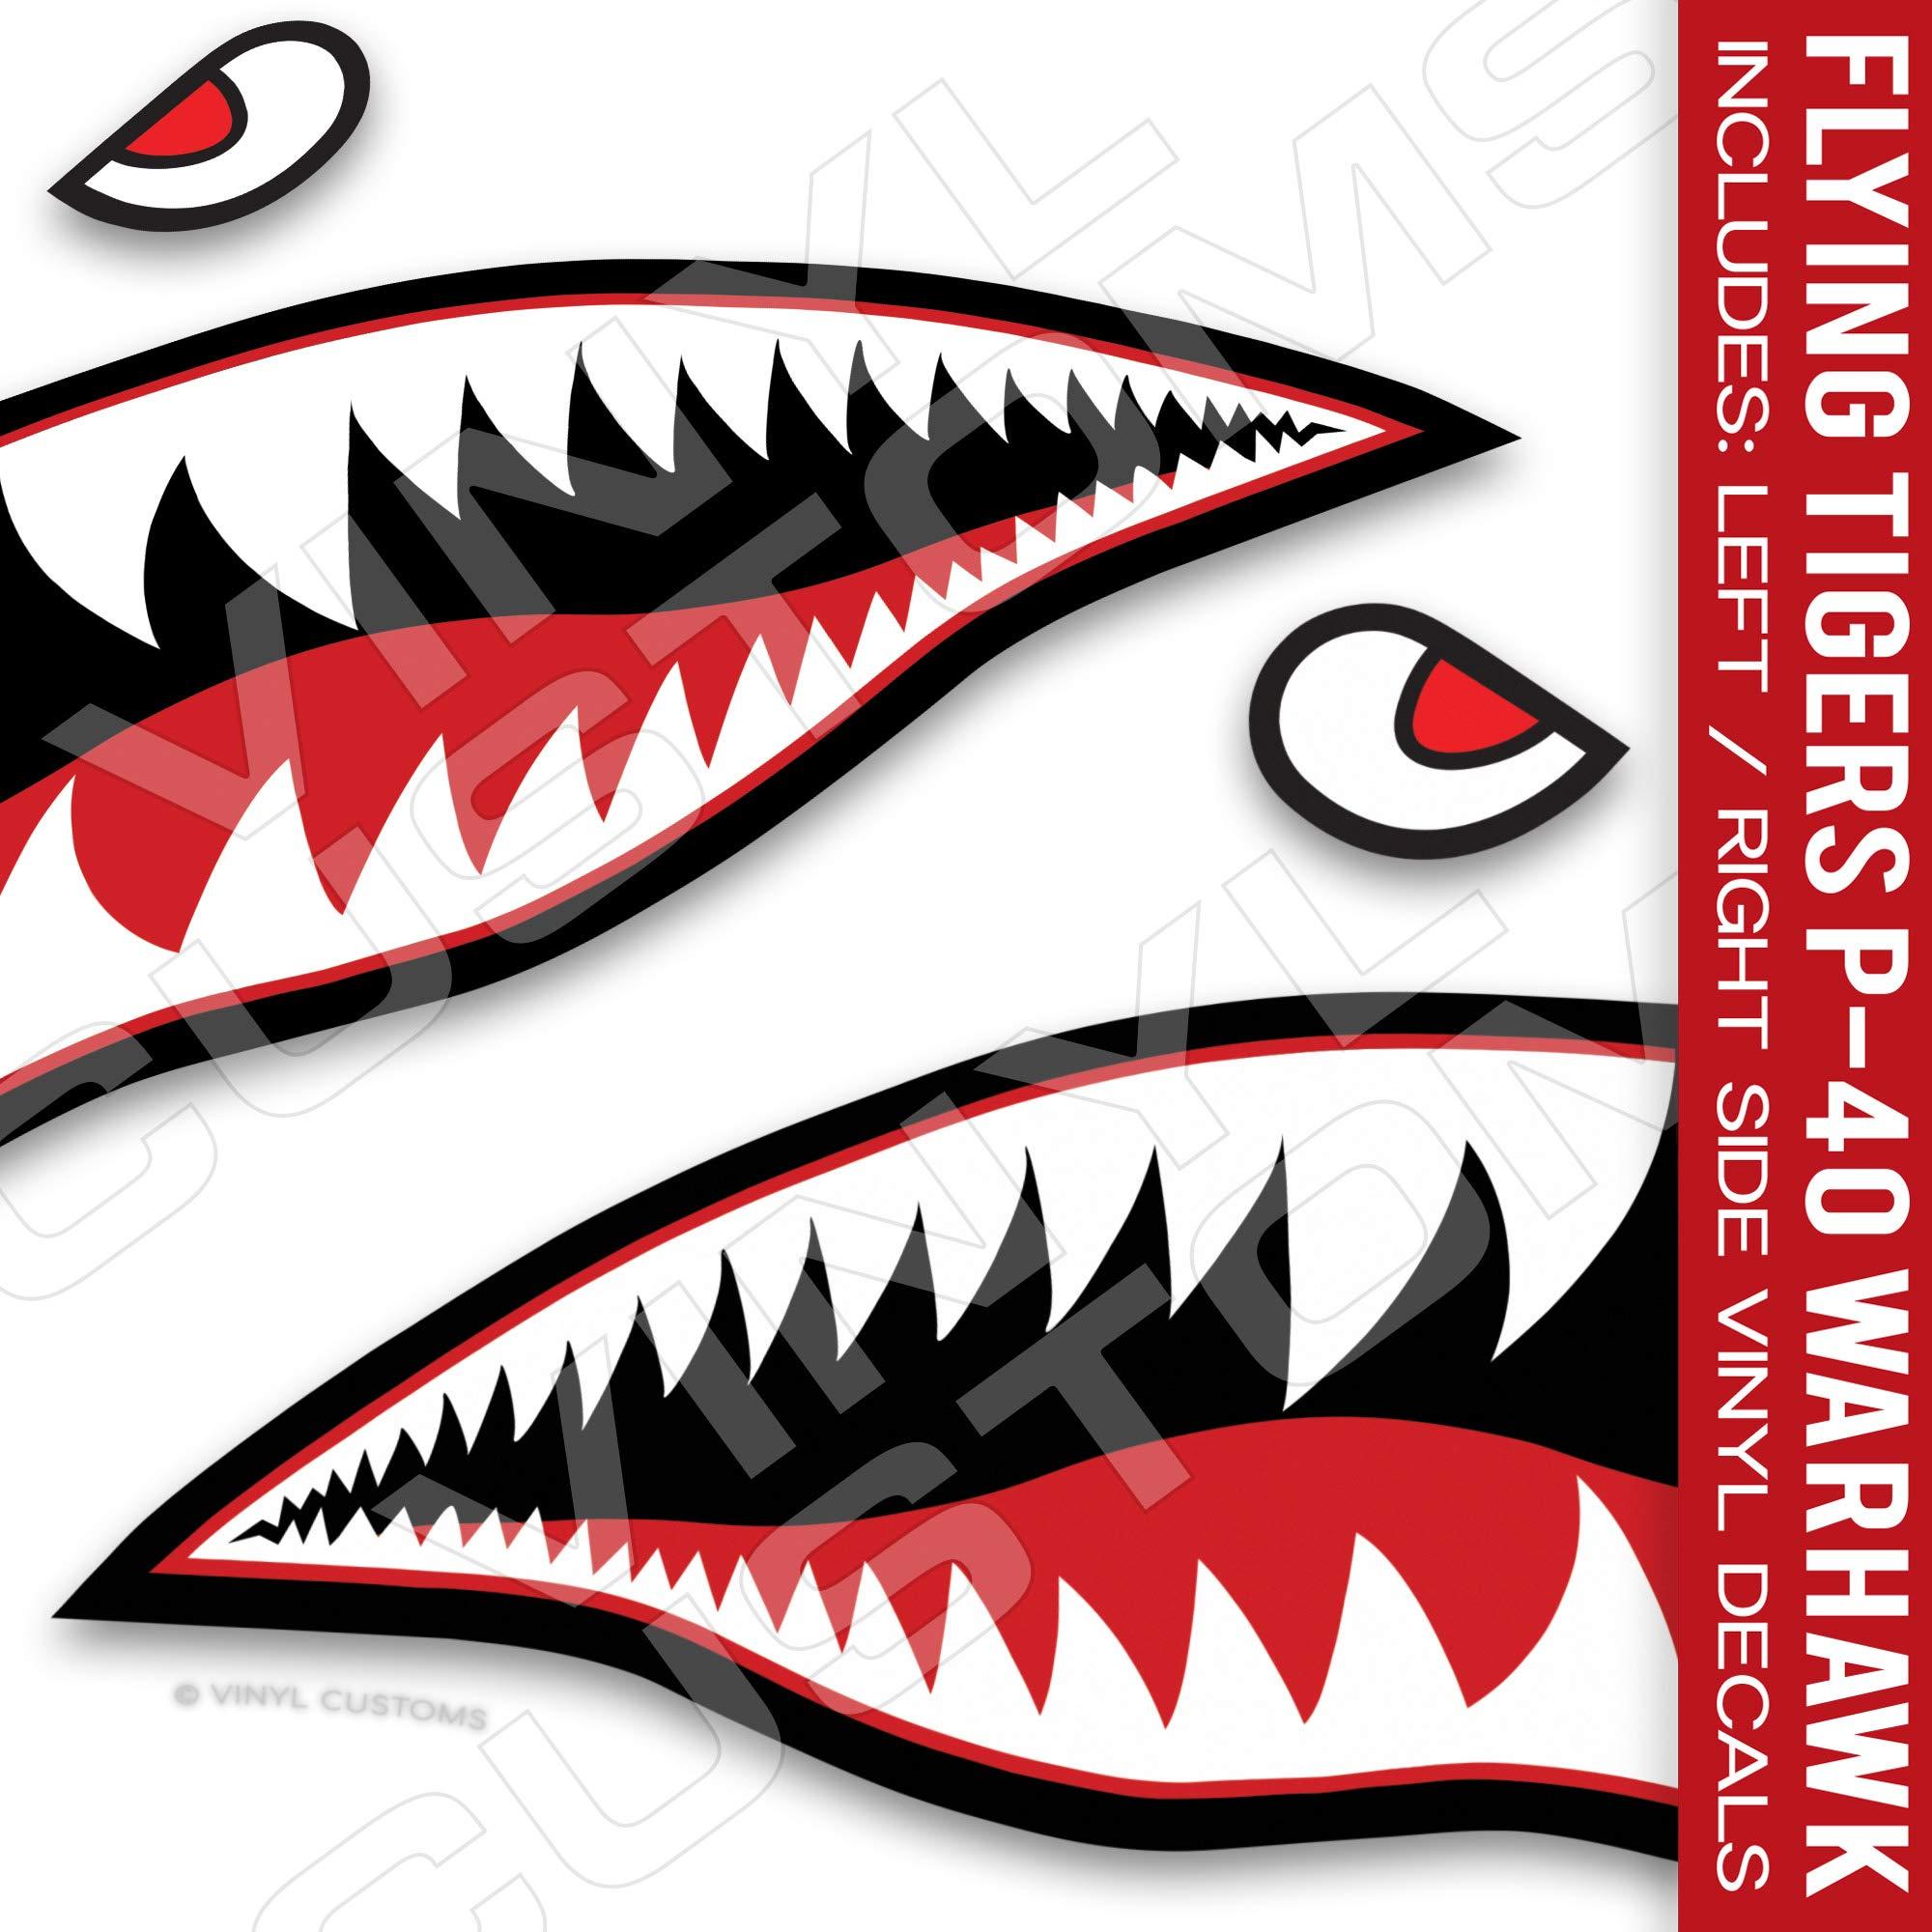 Flying Tigers Shark Mouth Teeth Die-Cut Vinyl Decals 50'' inches (1 Pair)